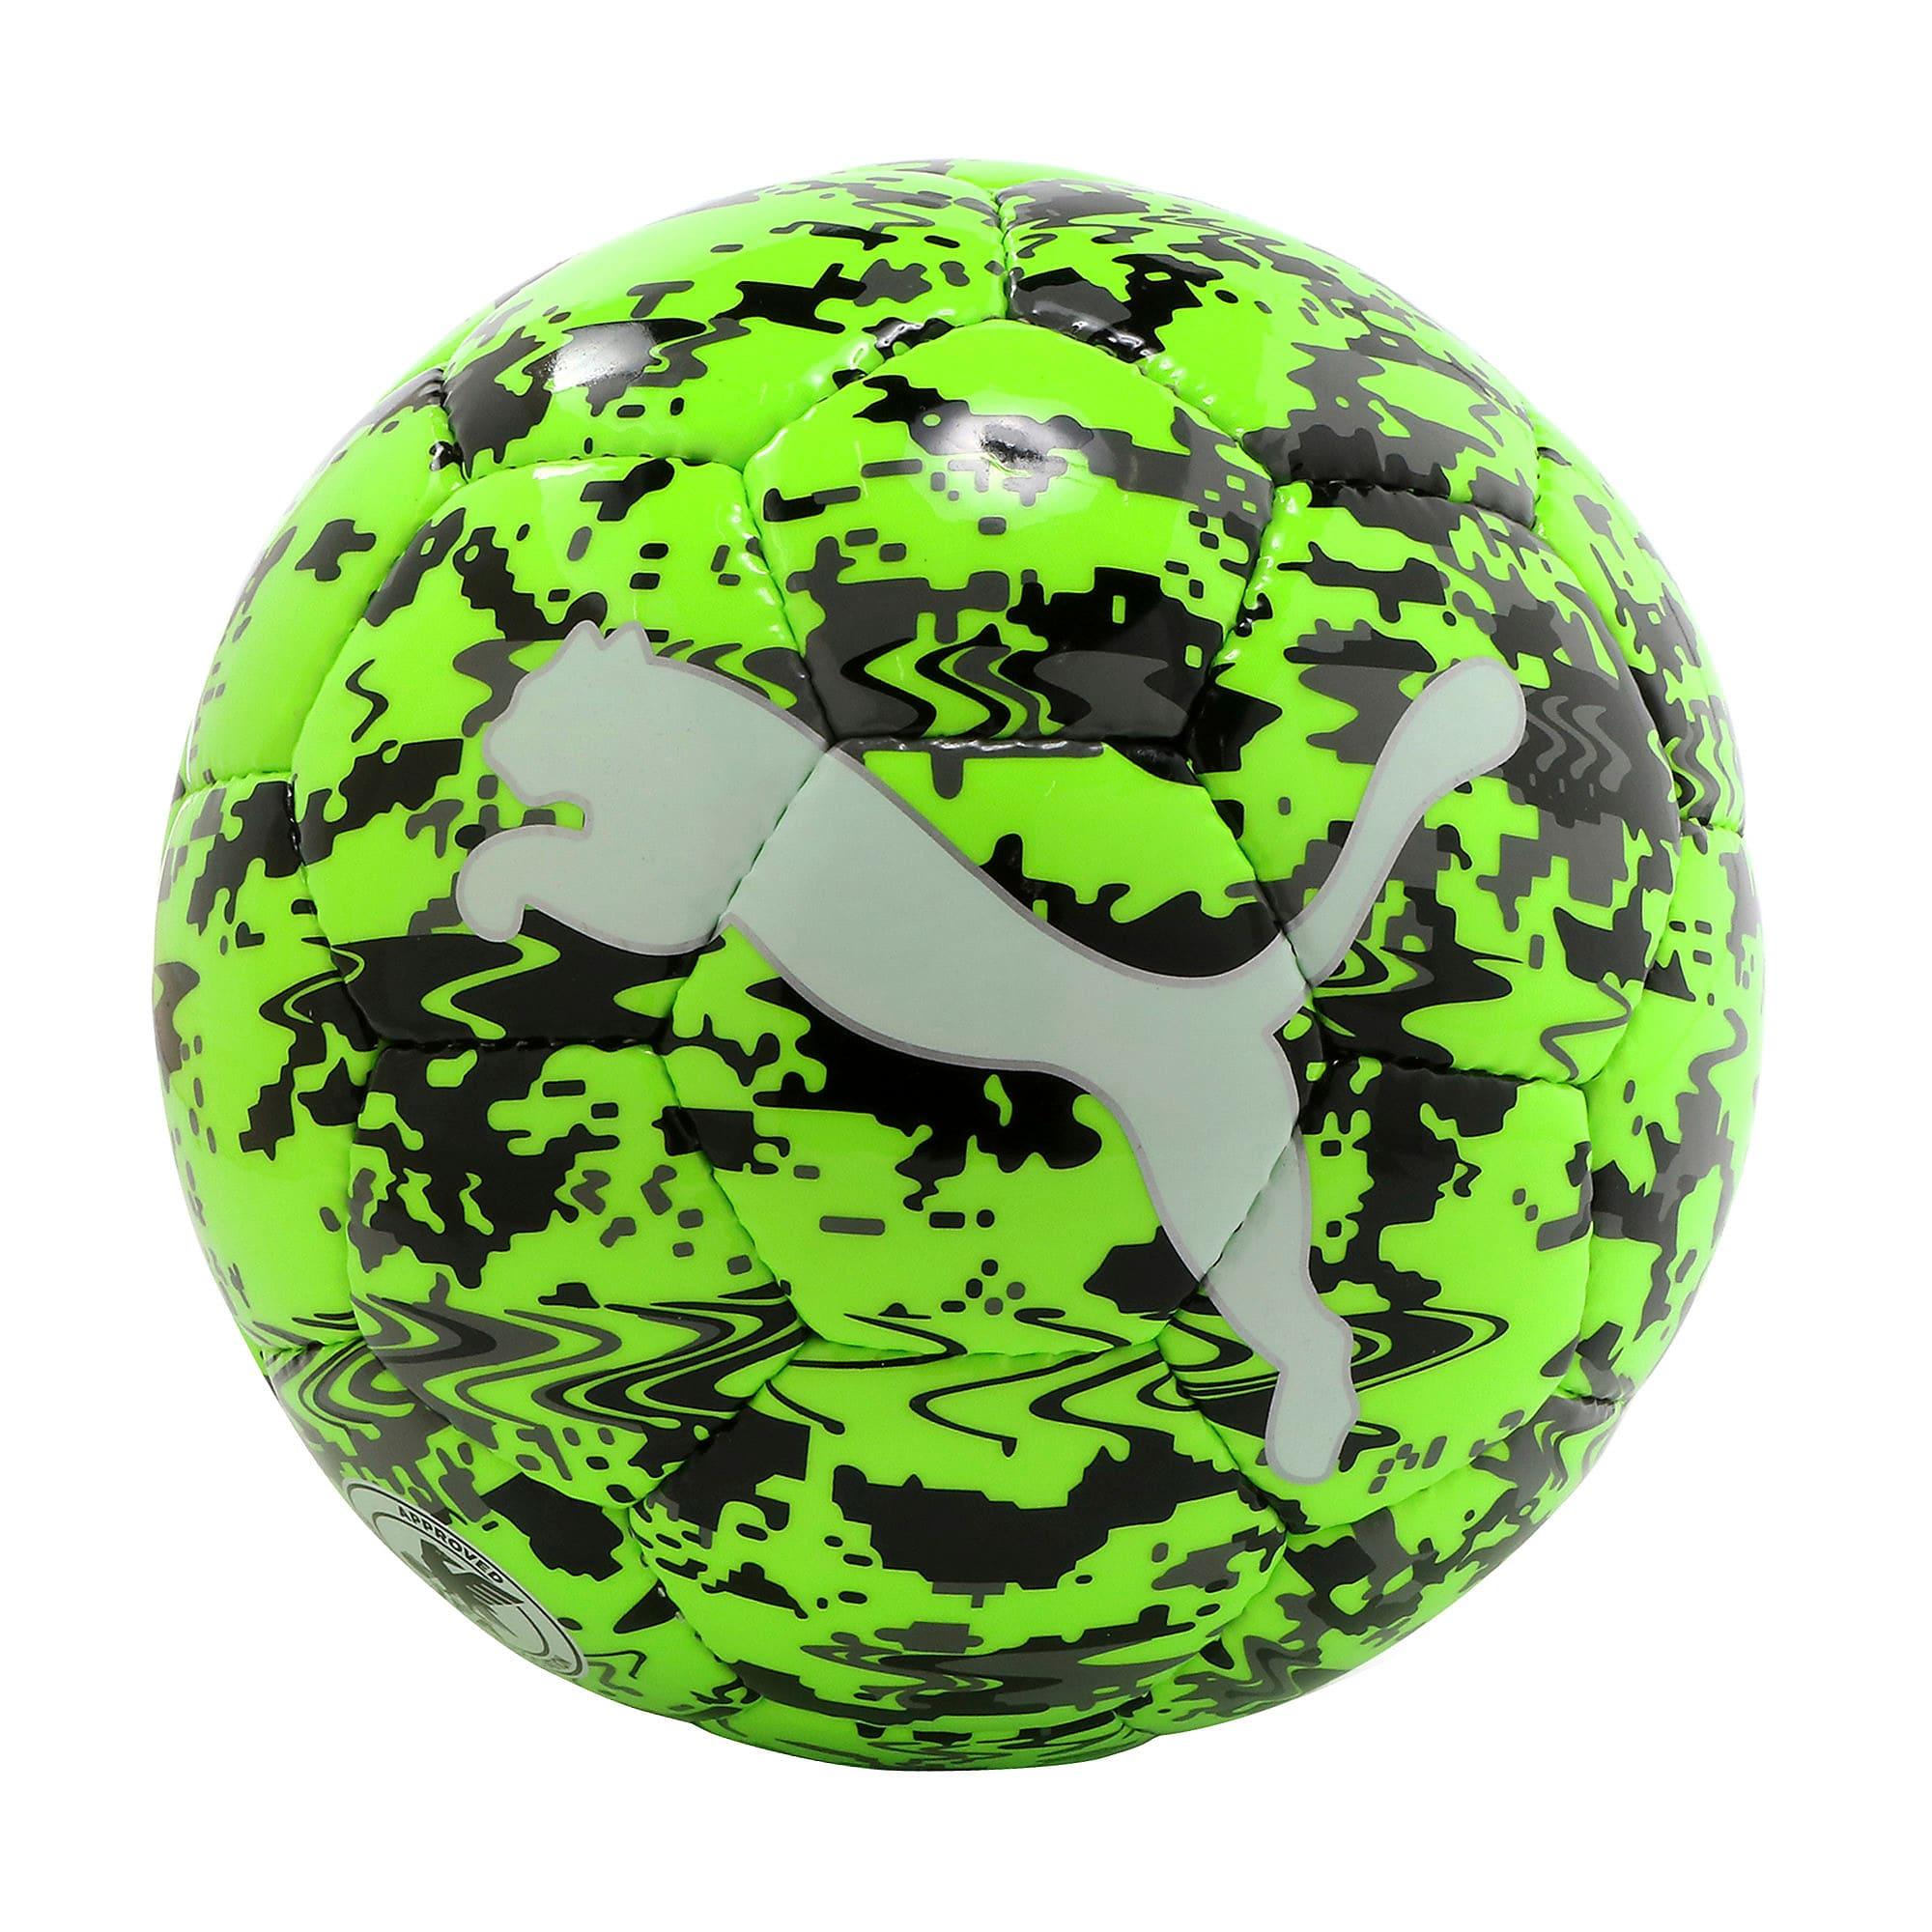 Thumbnail 1 of プーマ ワン レーザー サッカー ボール J, Green Gecko-Black-Gray, medium-JPN